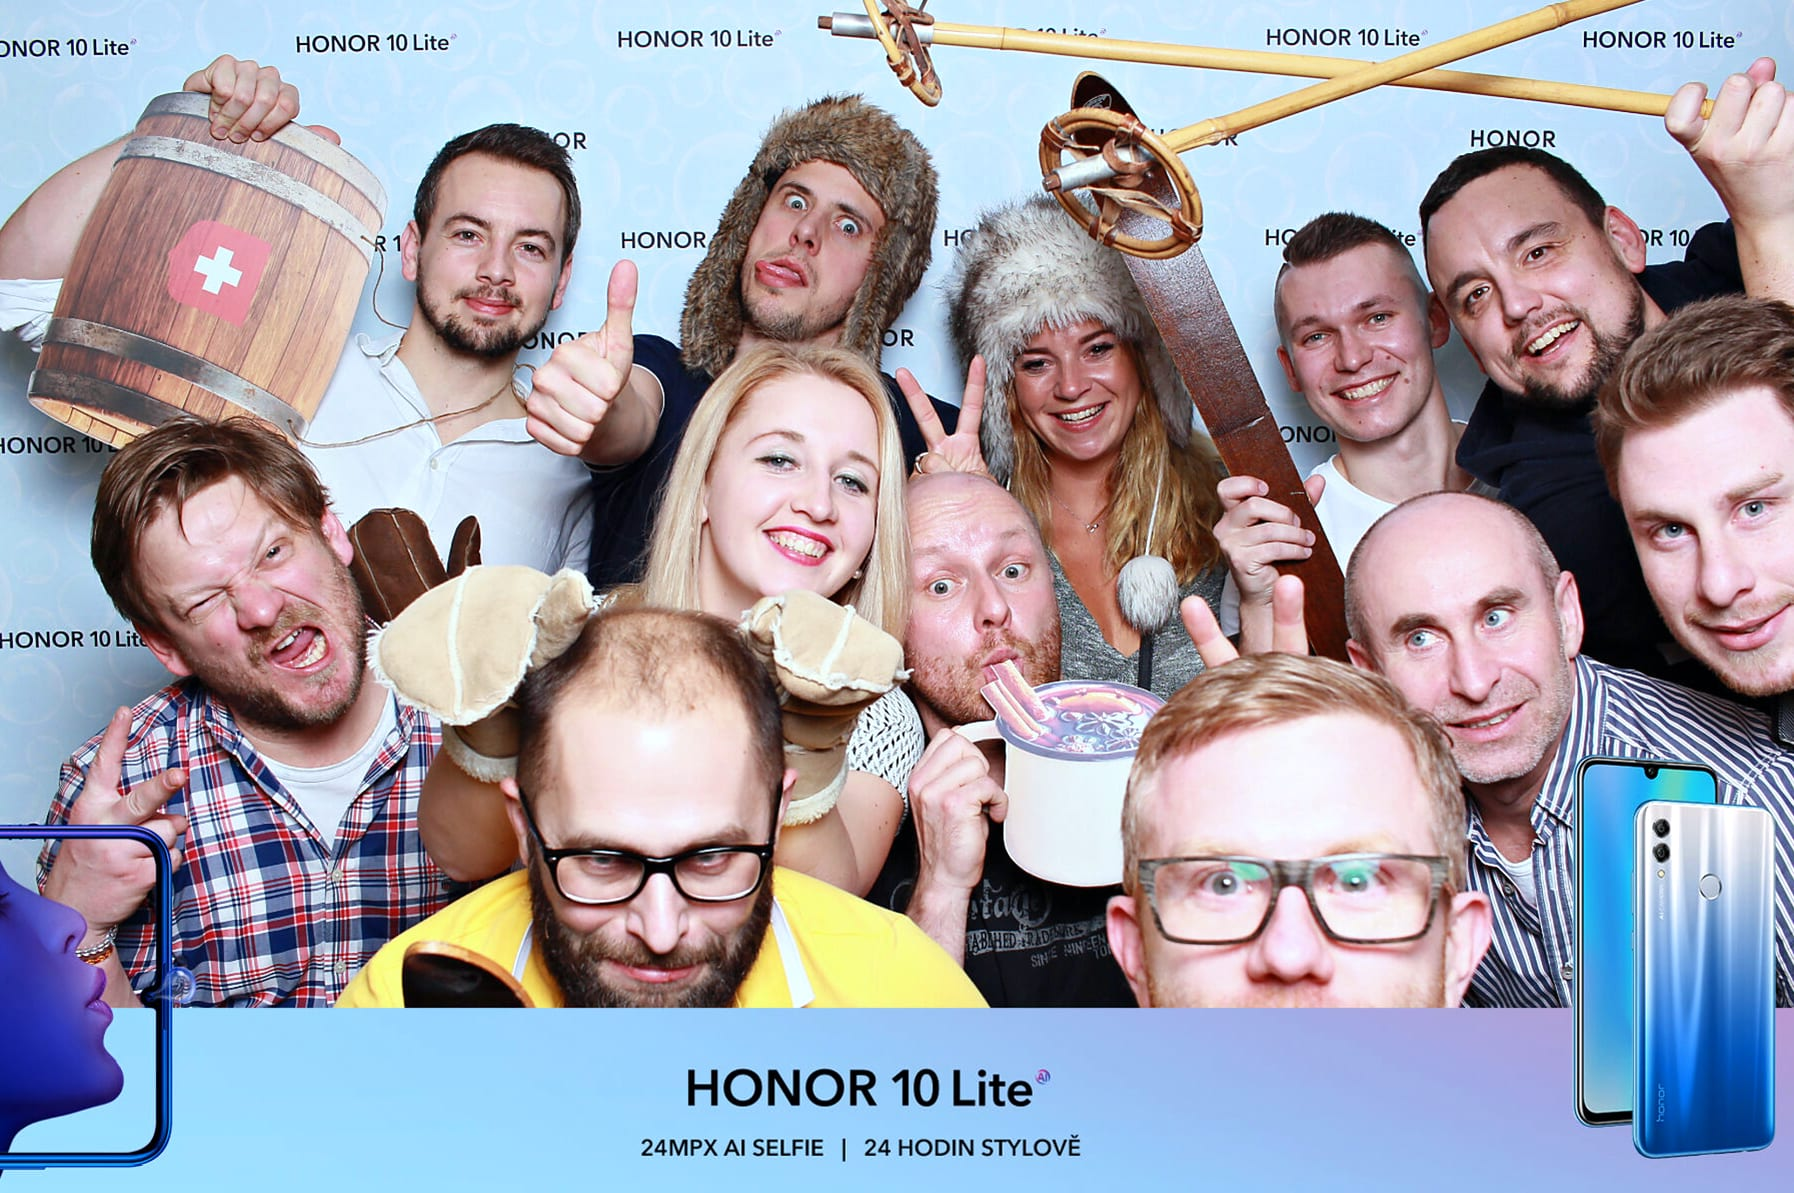 fotokoutek-hradec-kralove-promo-akce-honor-10-lite-15-1-2019-566687